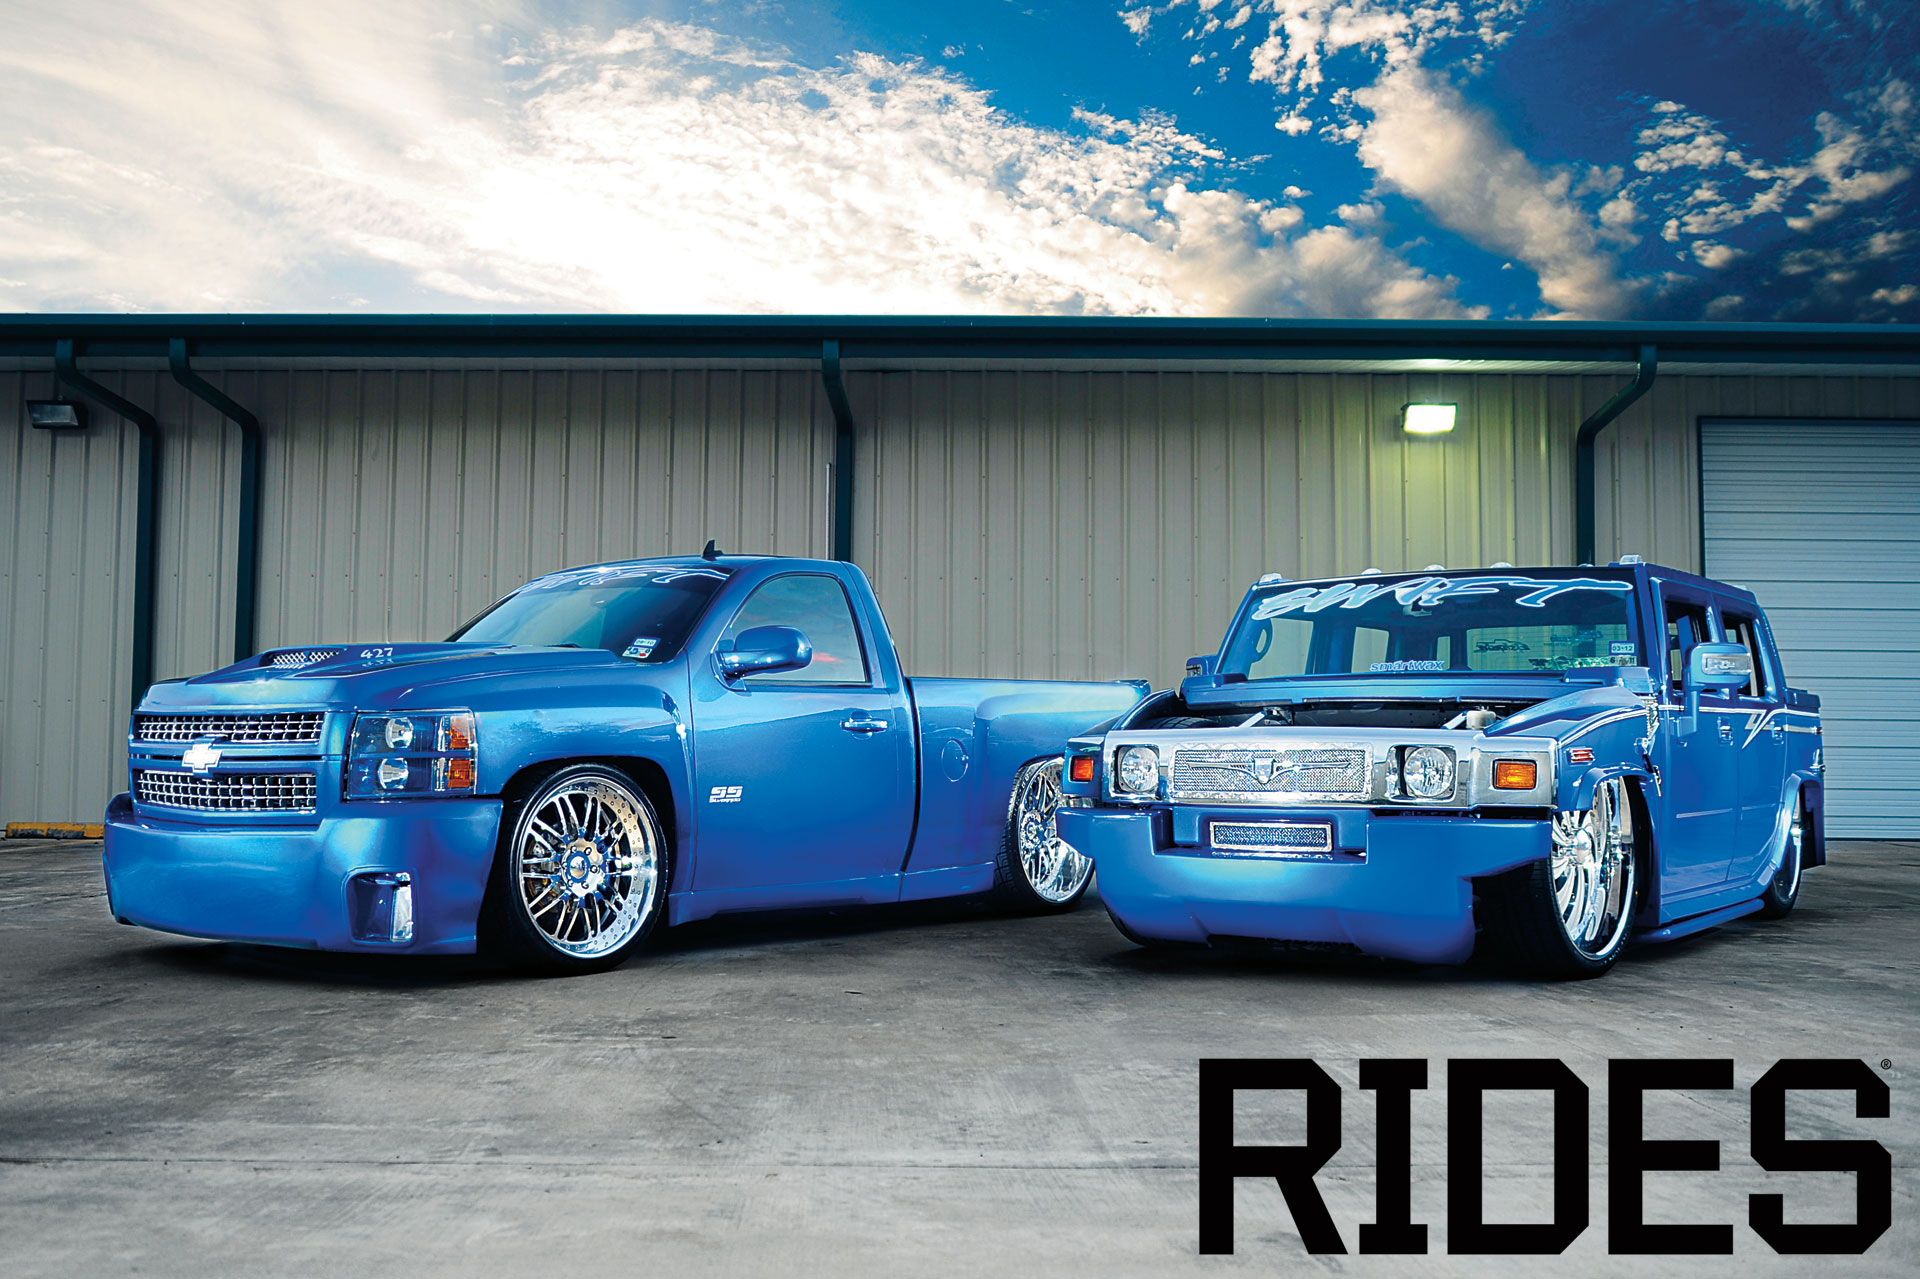 SWIFT Texas s Double Dose The Blues Rides Magazine